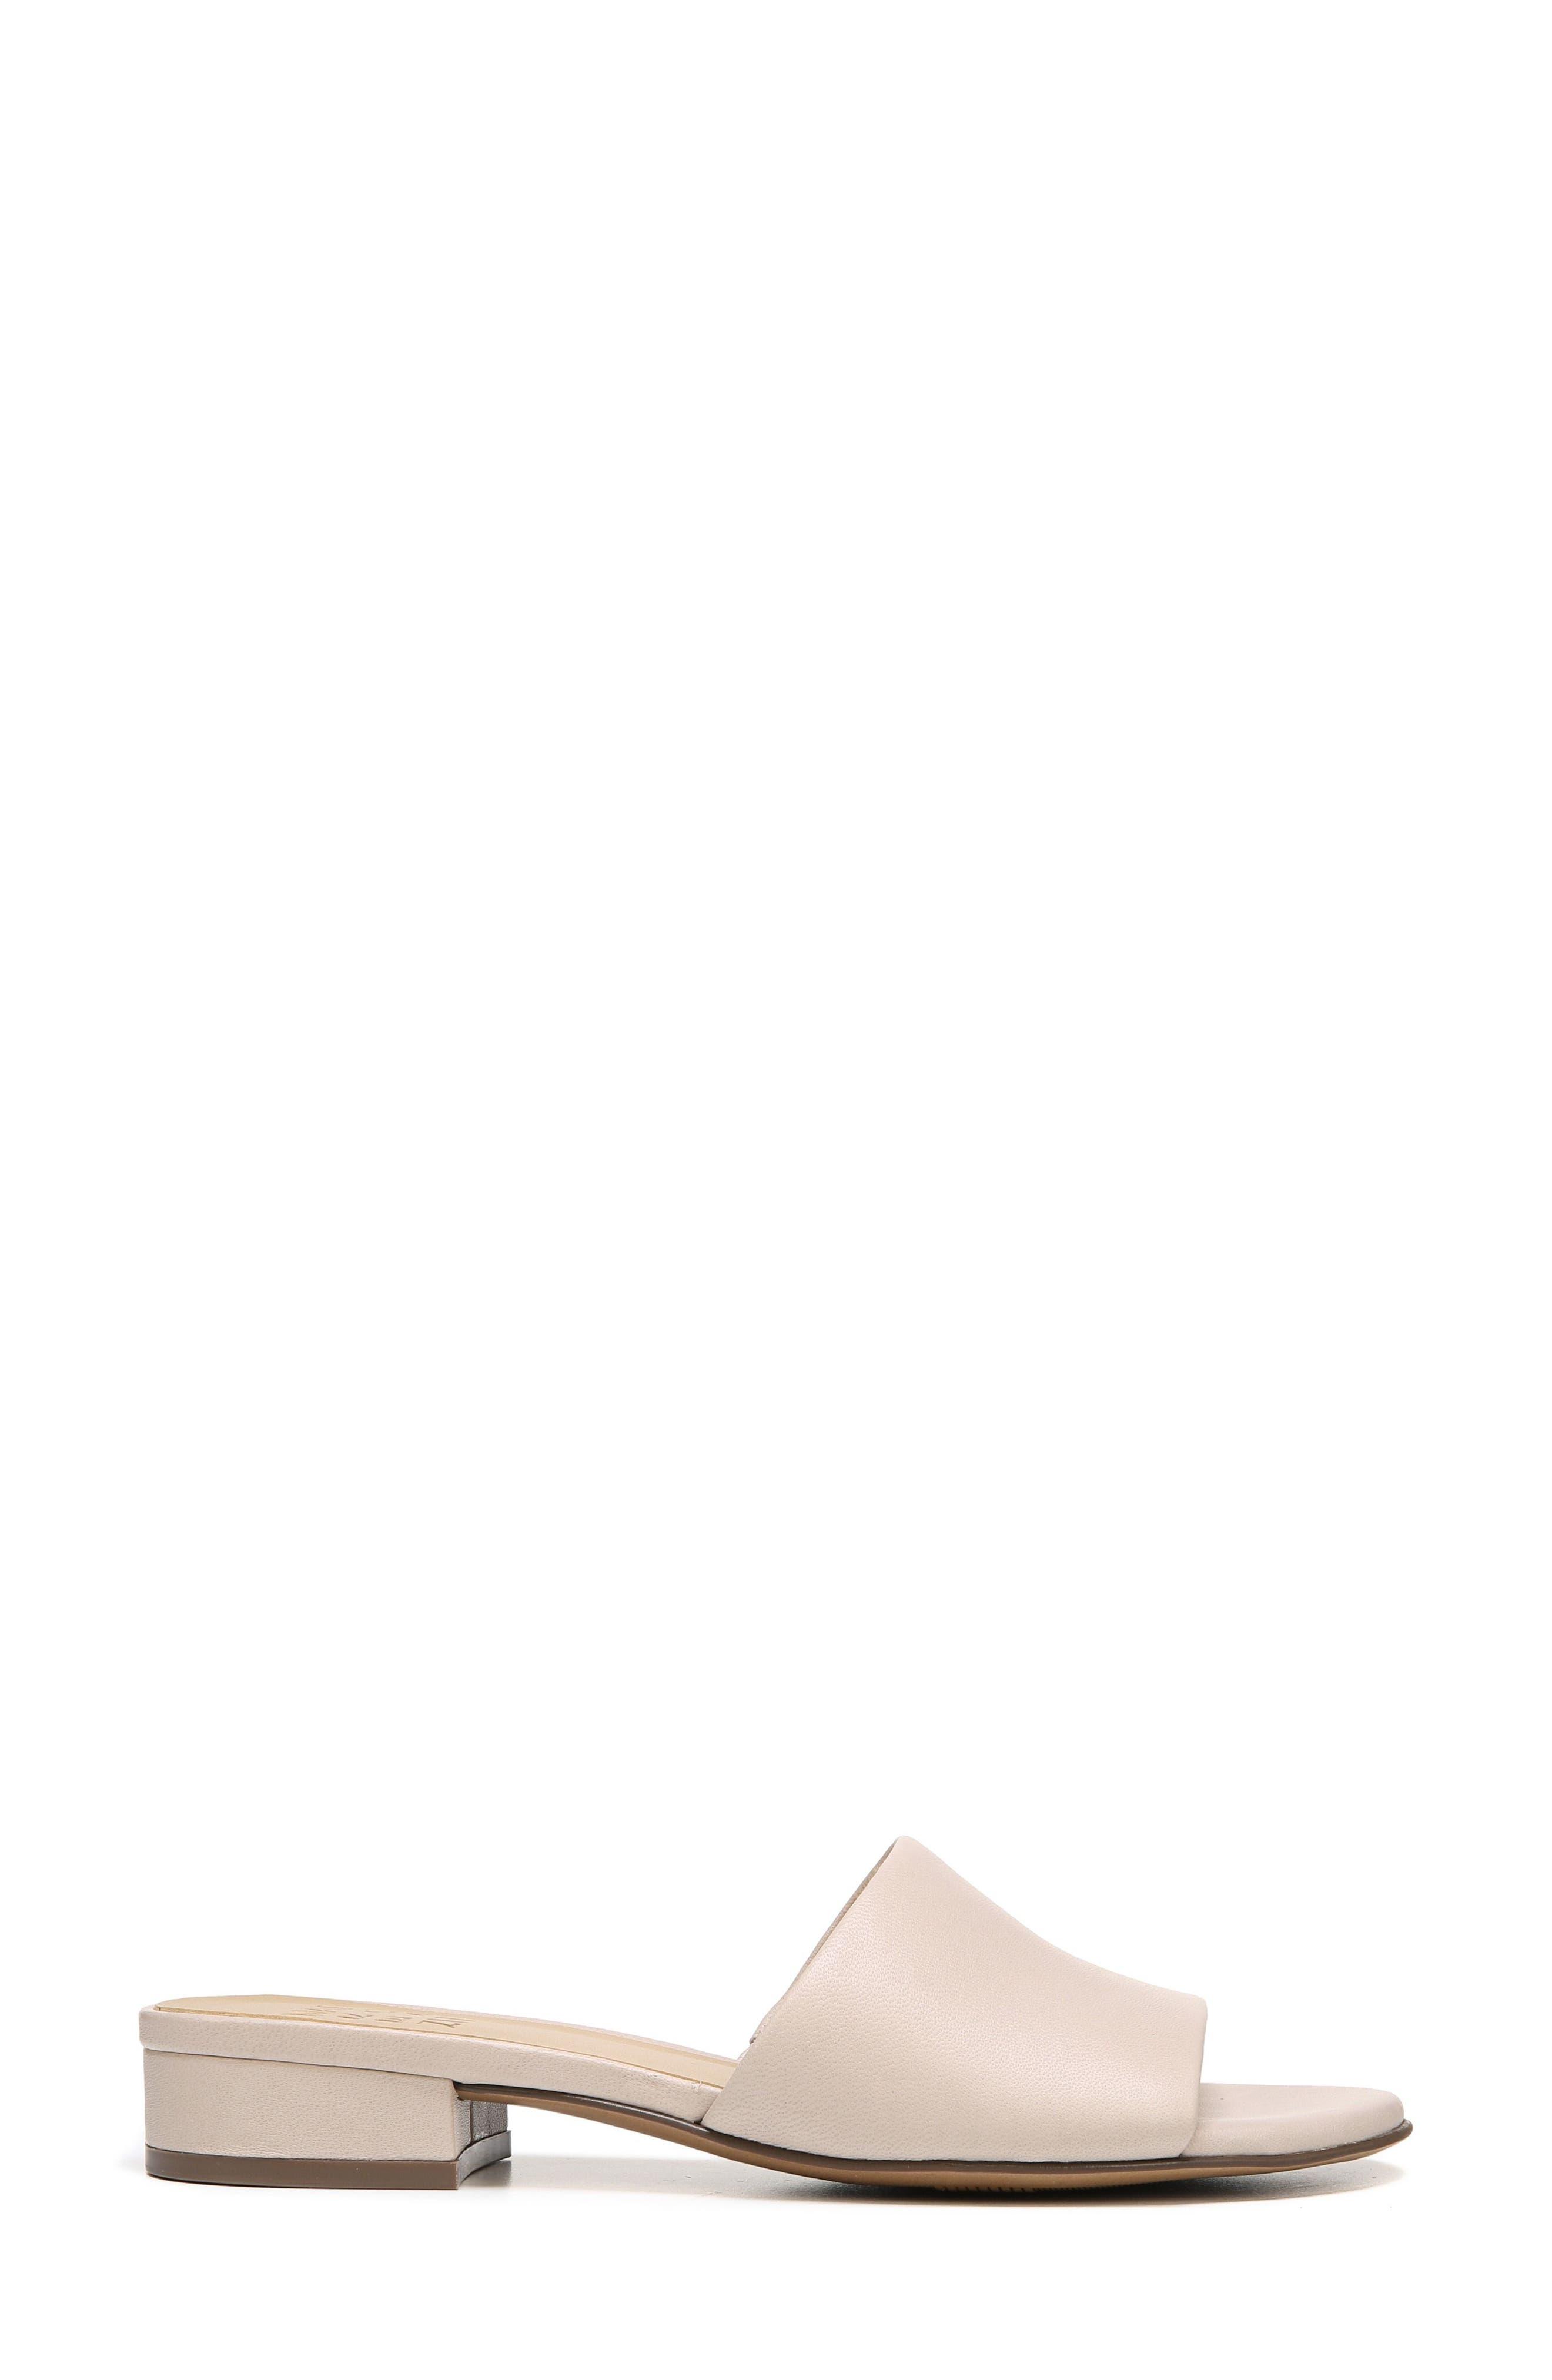 Mason Slide Sandal,                             Alternate thumbnail 3, color,                             Grey Leather